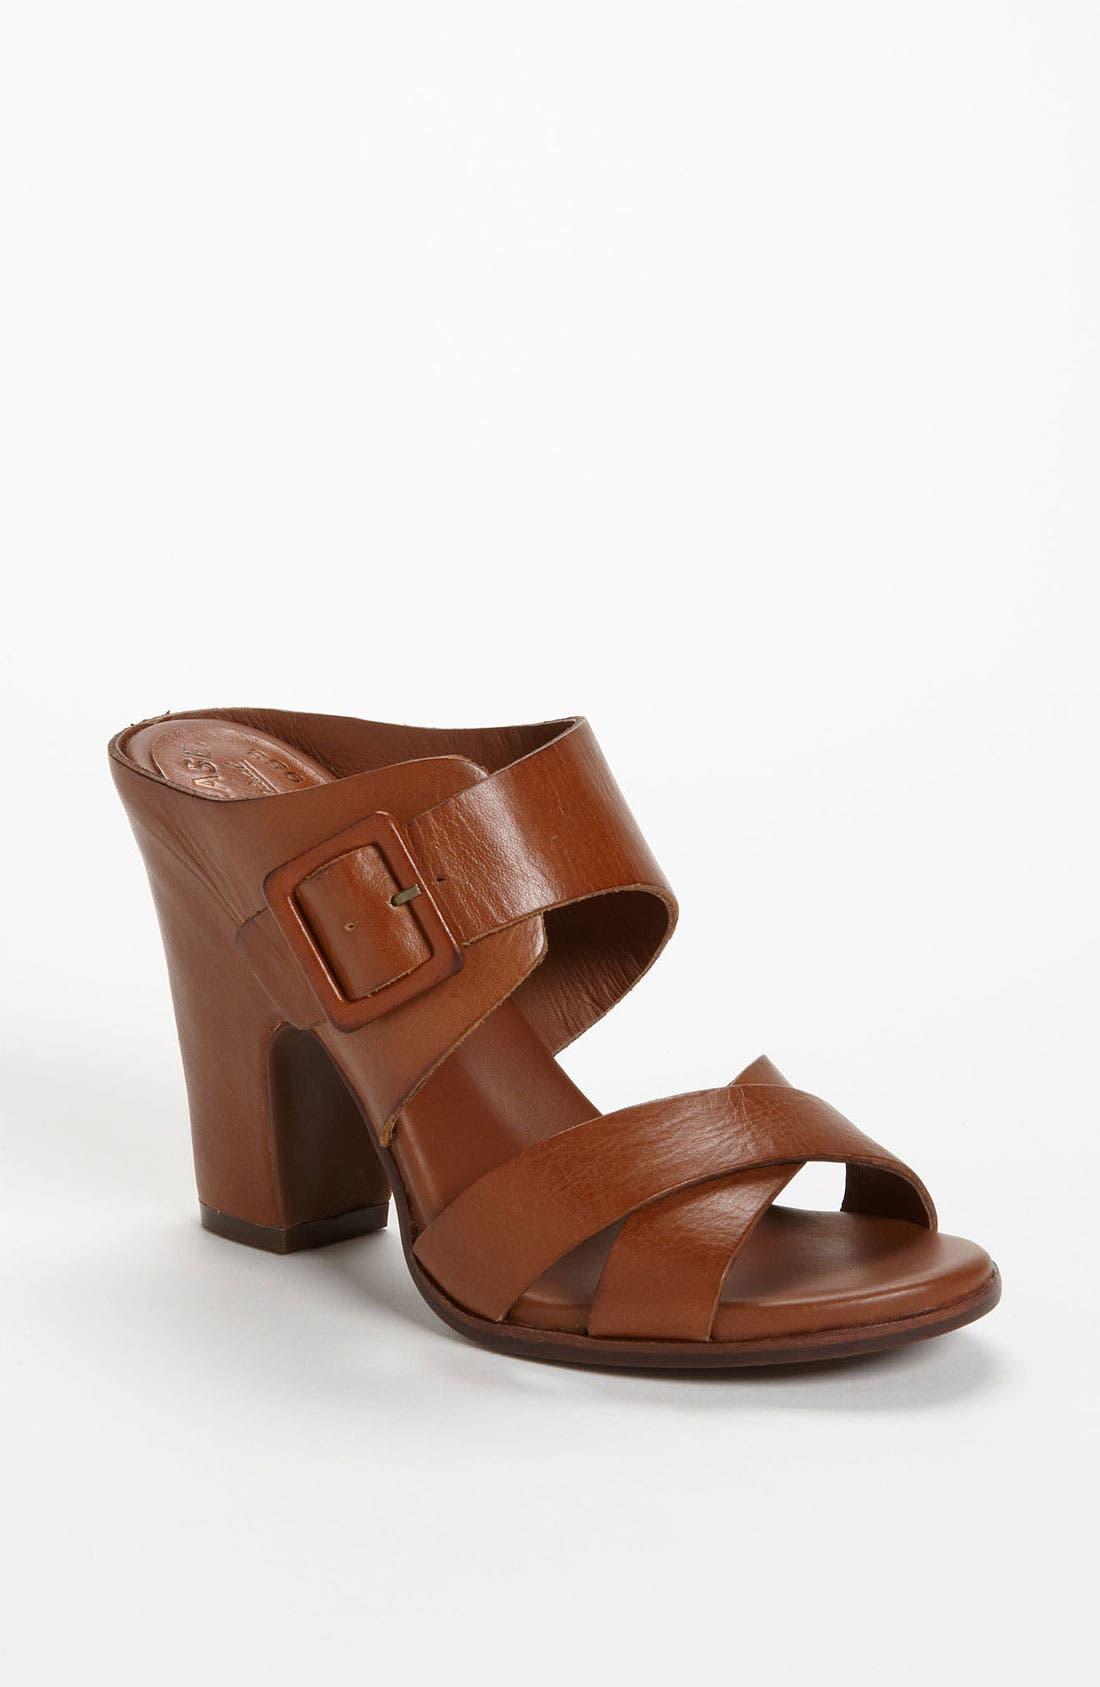 Alternate Image 1 Selected - Kork-Ease 'Colette' Sandal